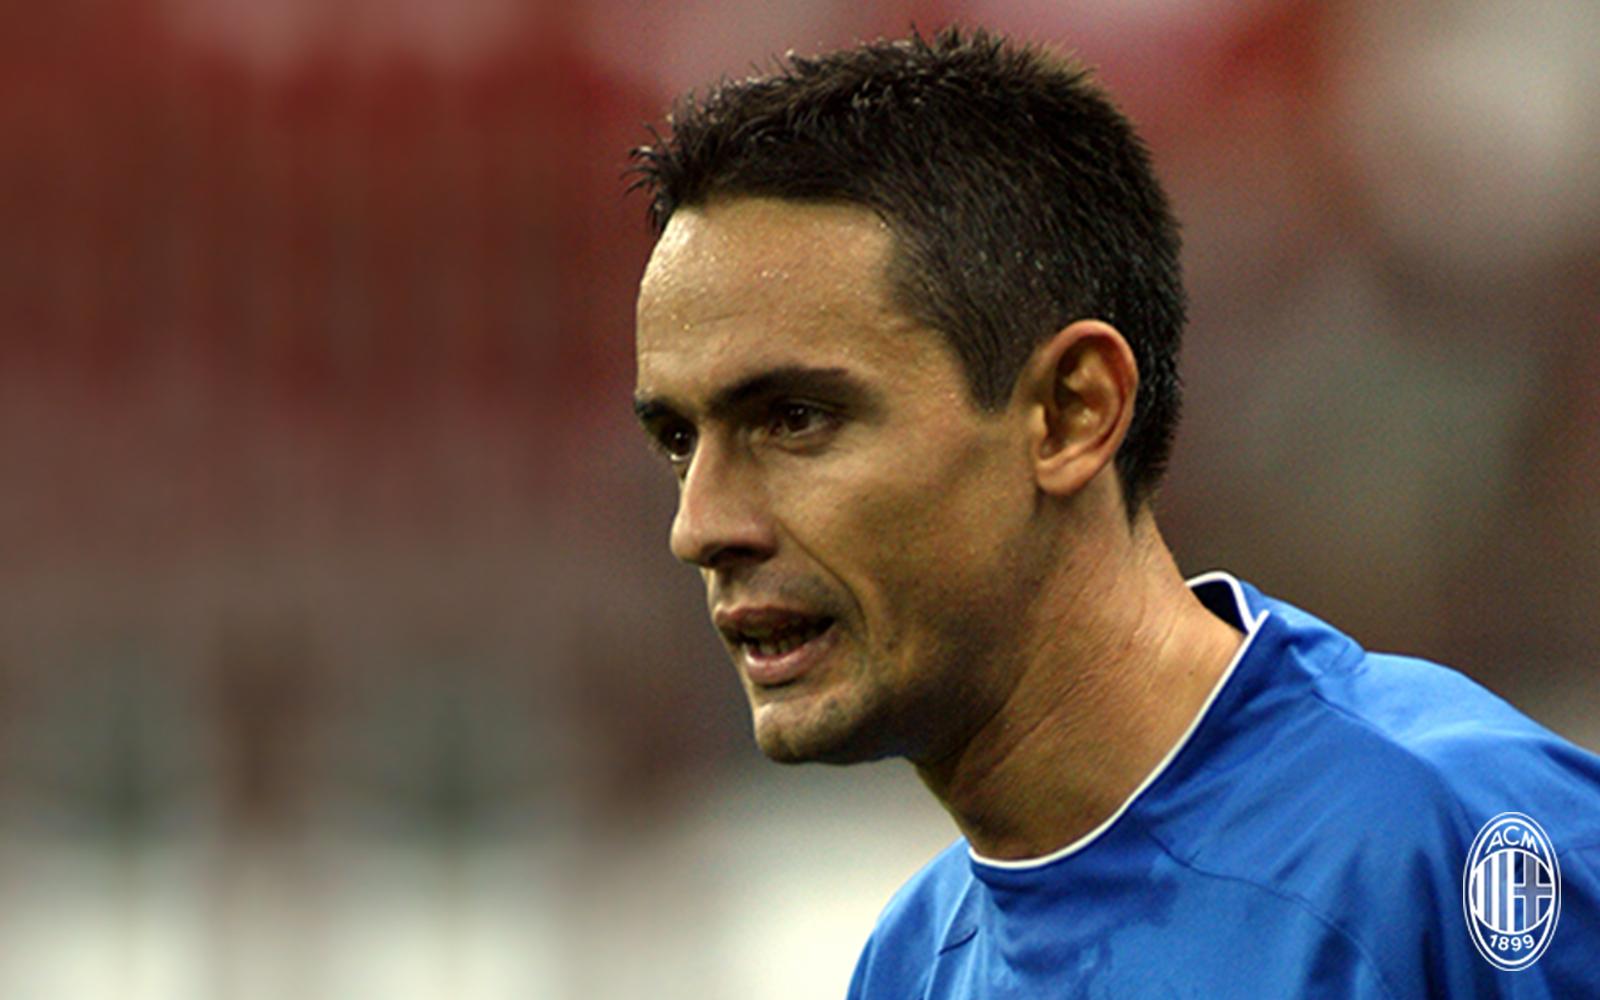 News-interna-TBT-Inzaghi-Italia-06.09.18-Inzaghi.png.jpg